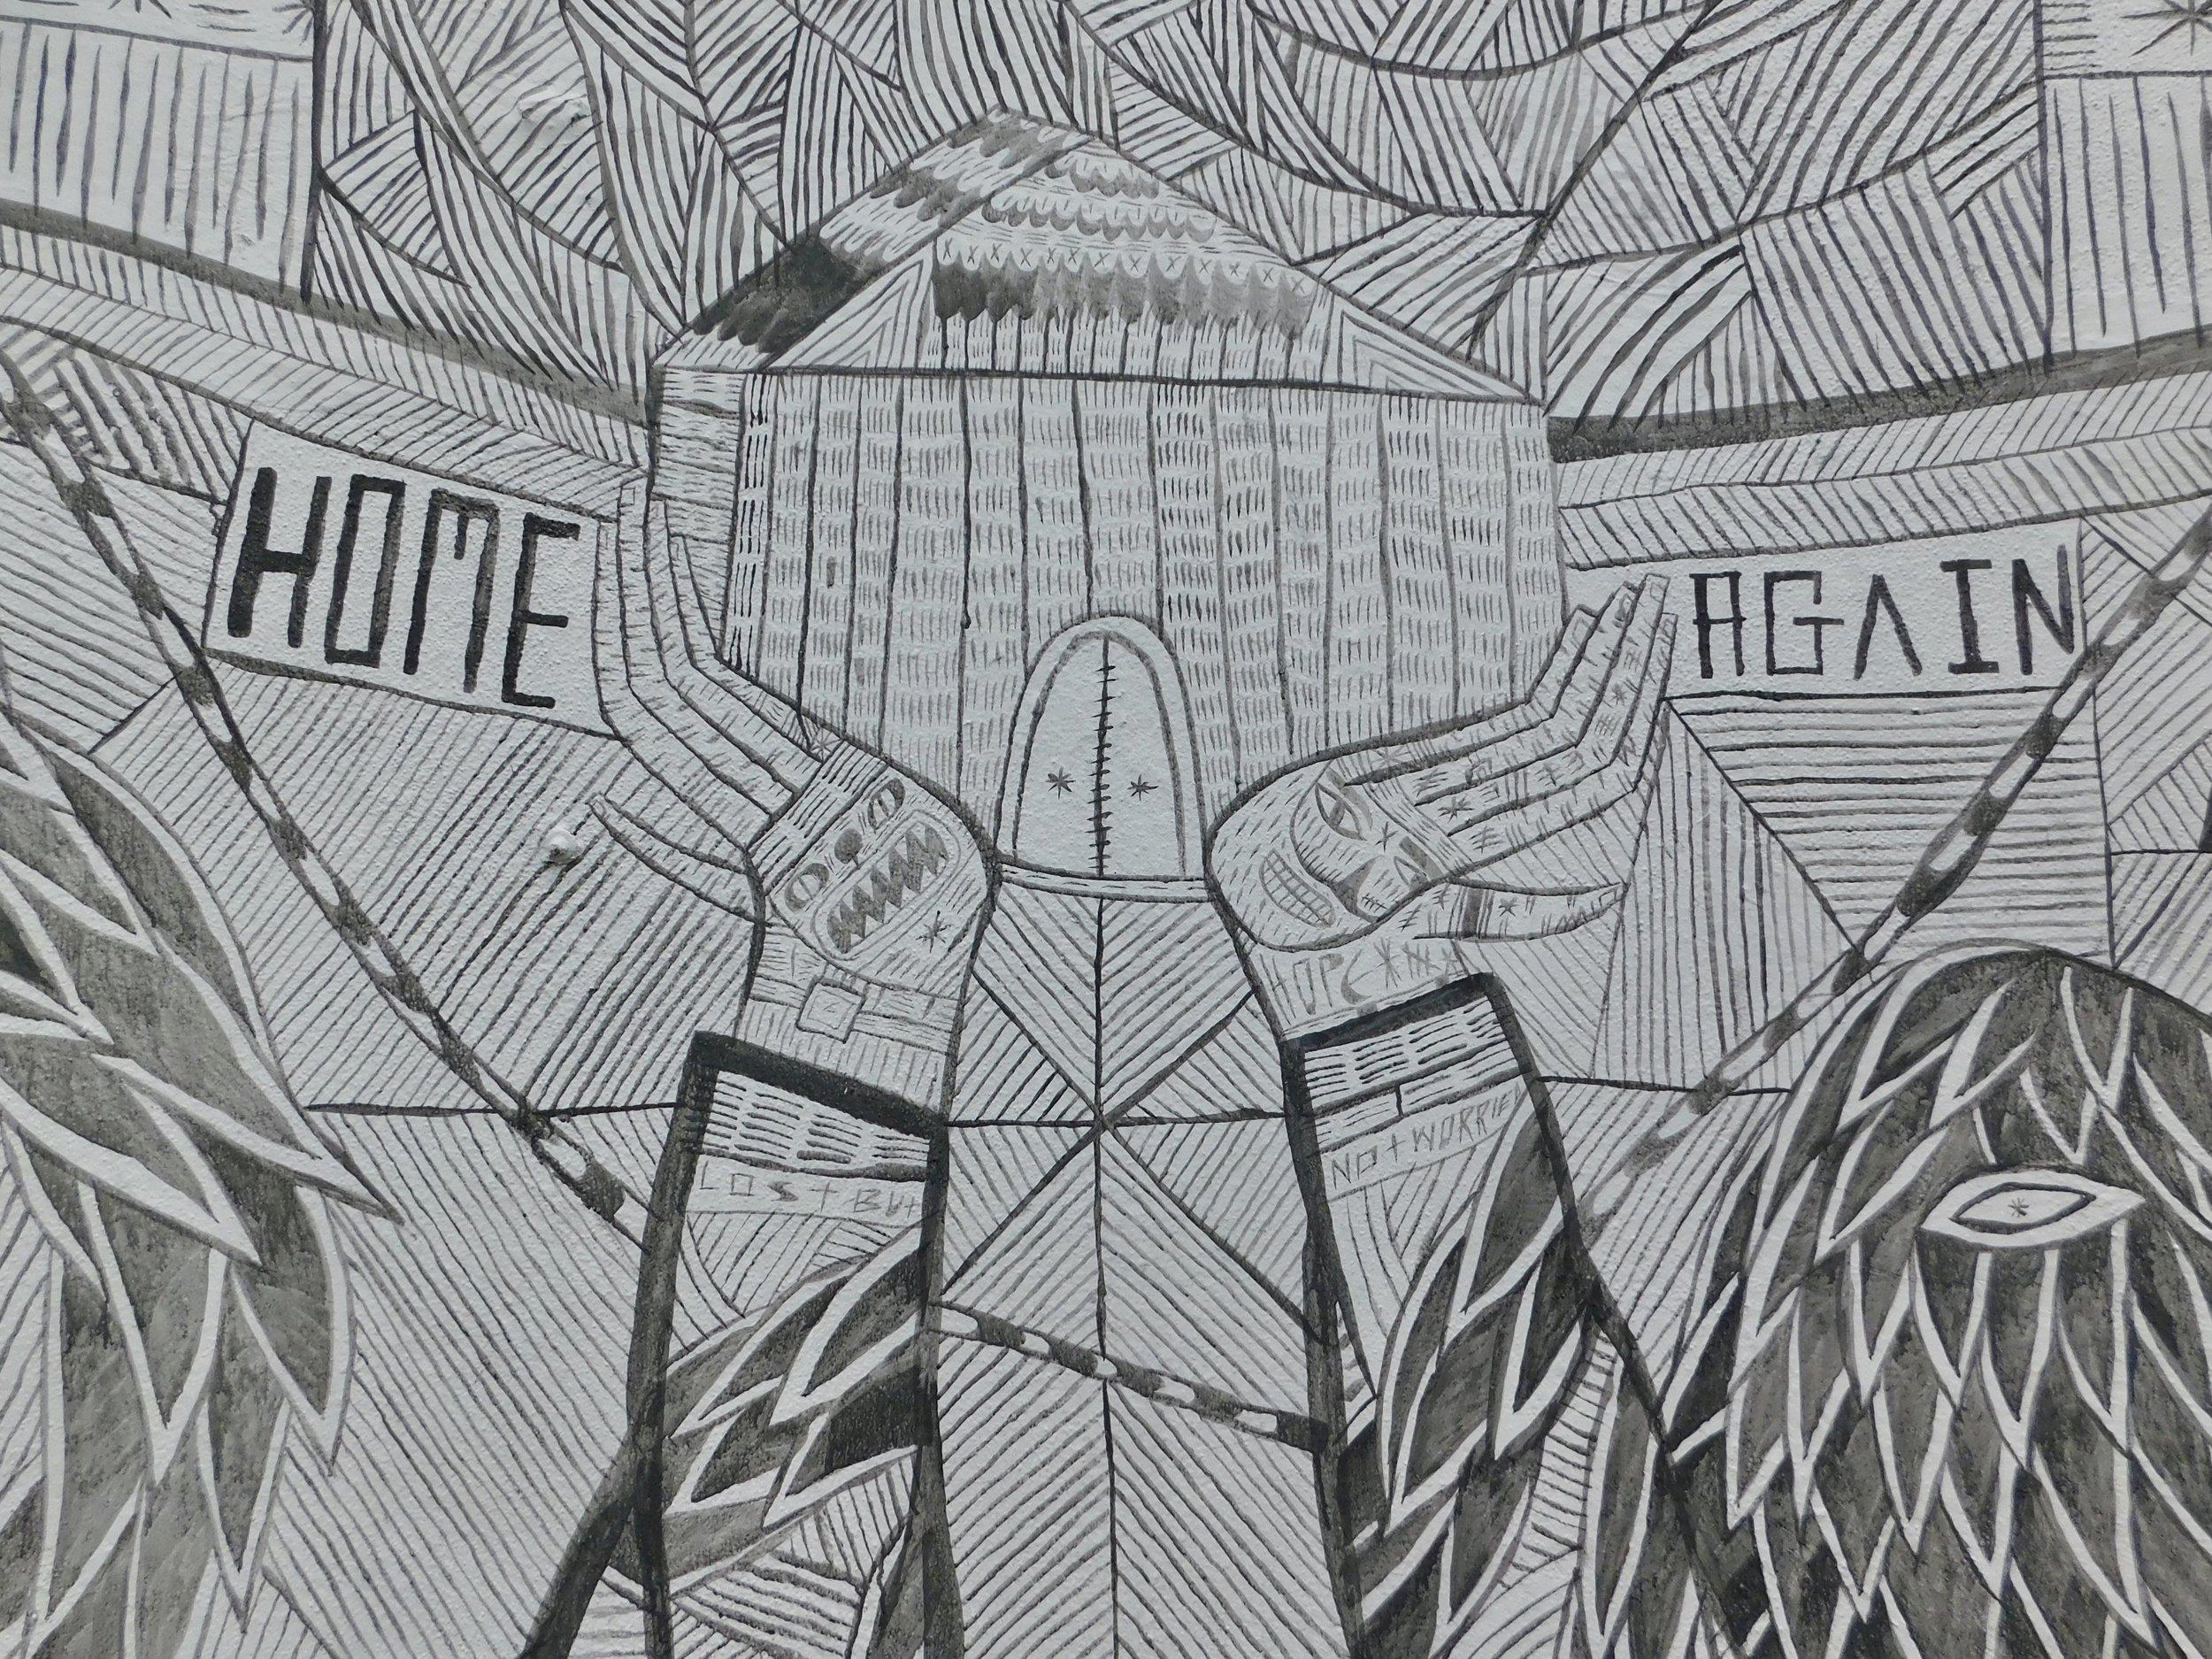 Detail of Street Art, Bushwick Collective, Brooklyn, NY